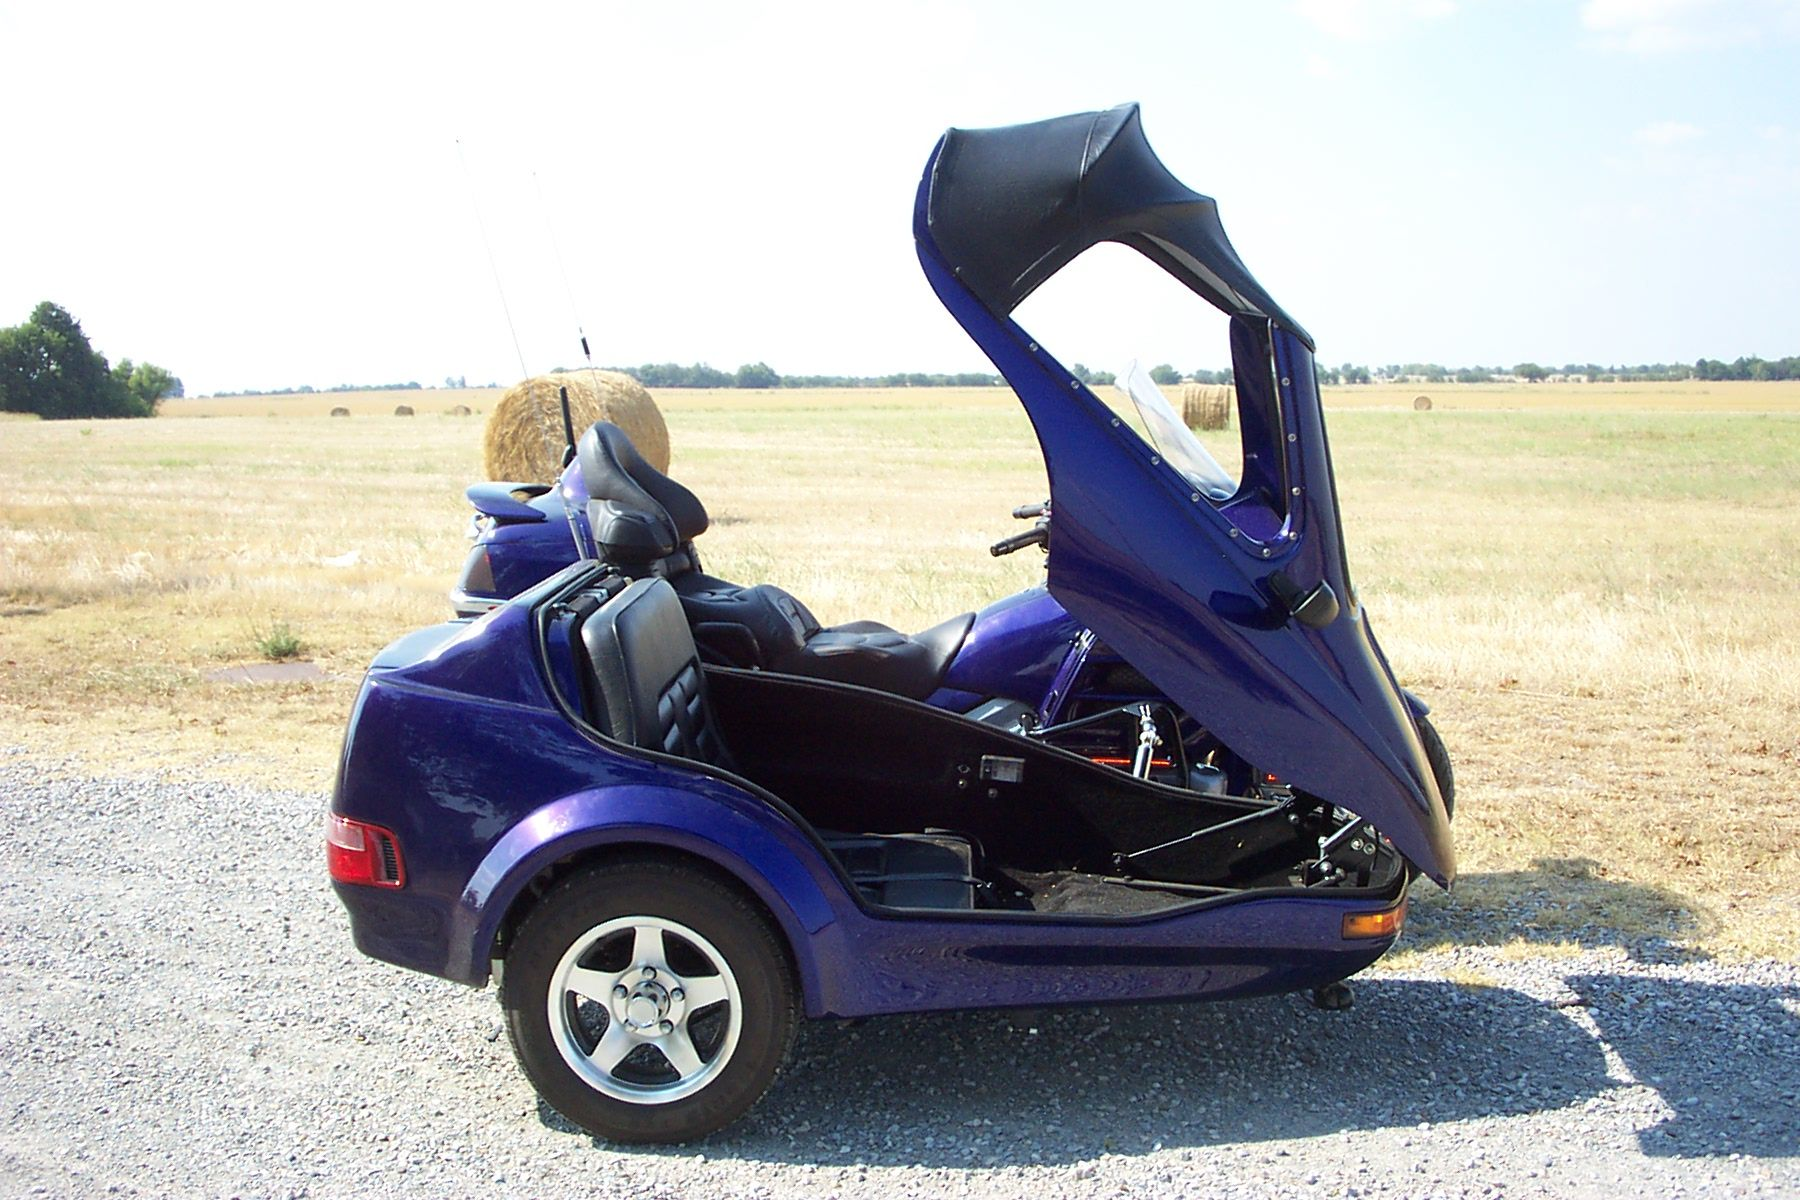 sidecar for Honda Goldwing 1800 | Wish List | Honda scooters, Honda